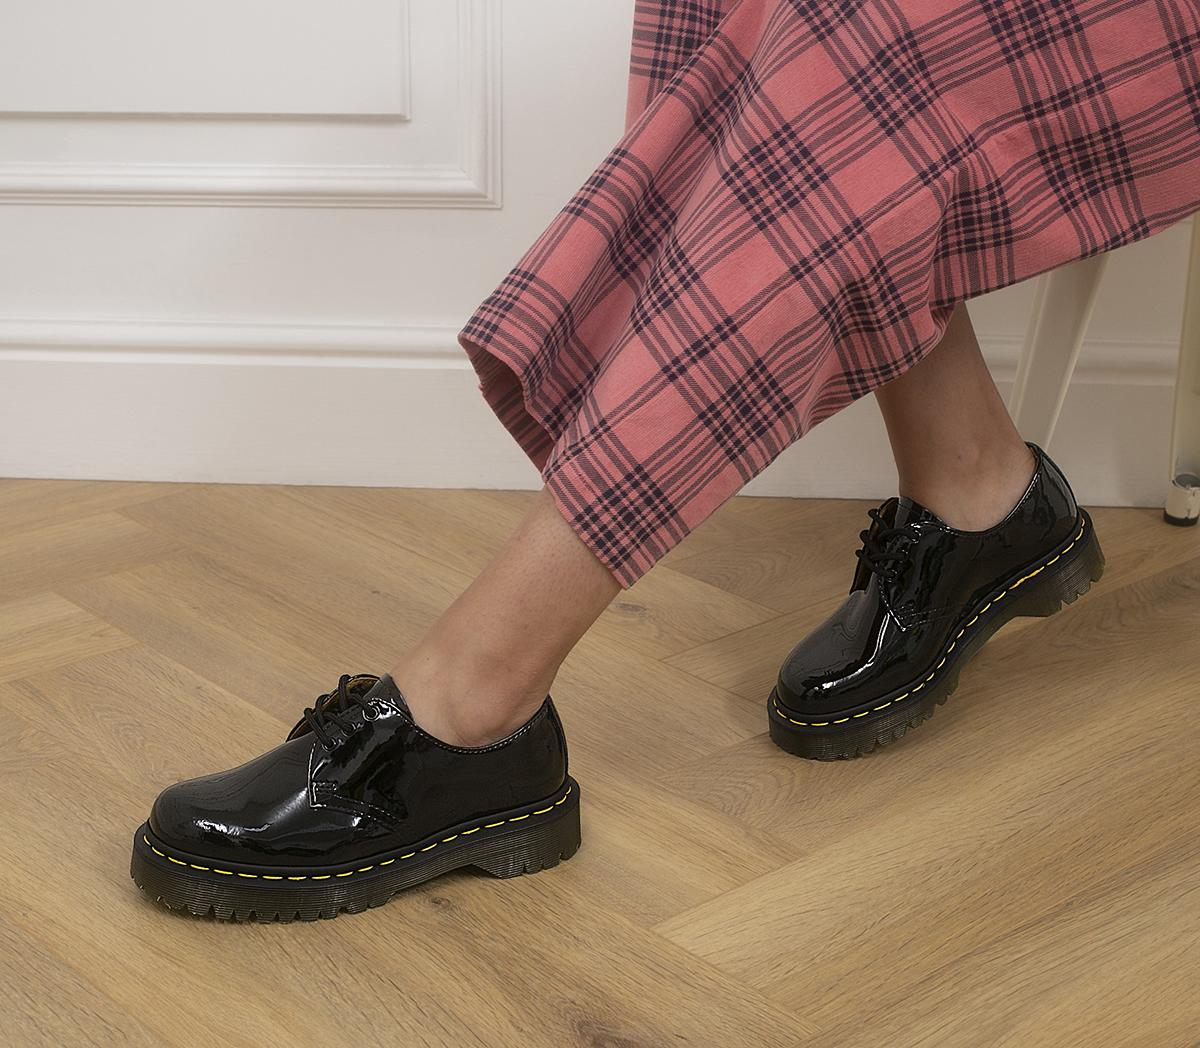 Bex Shoes